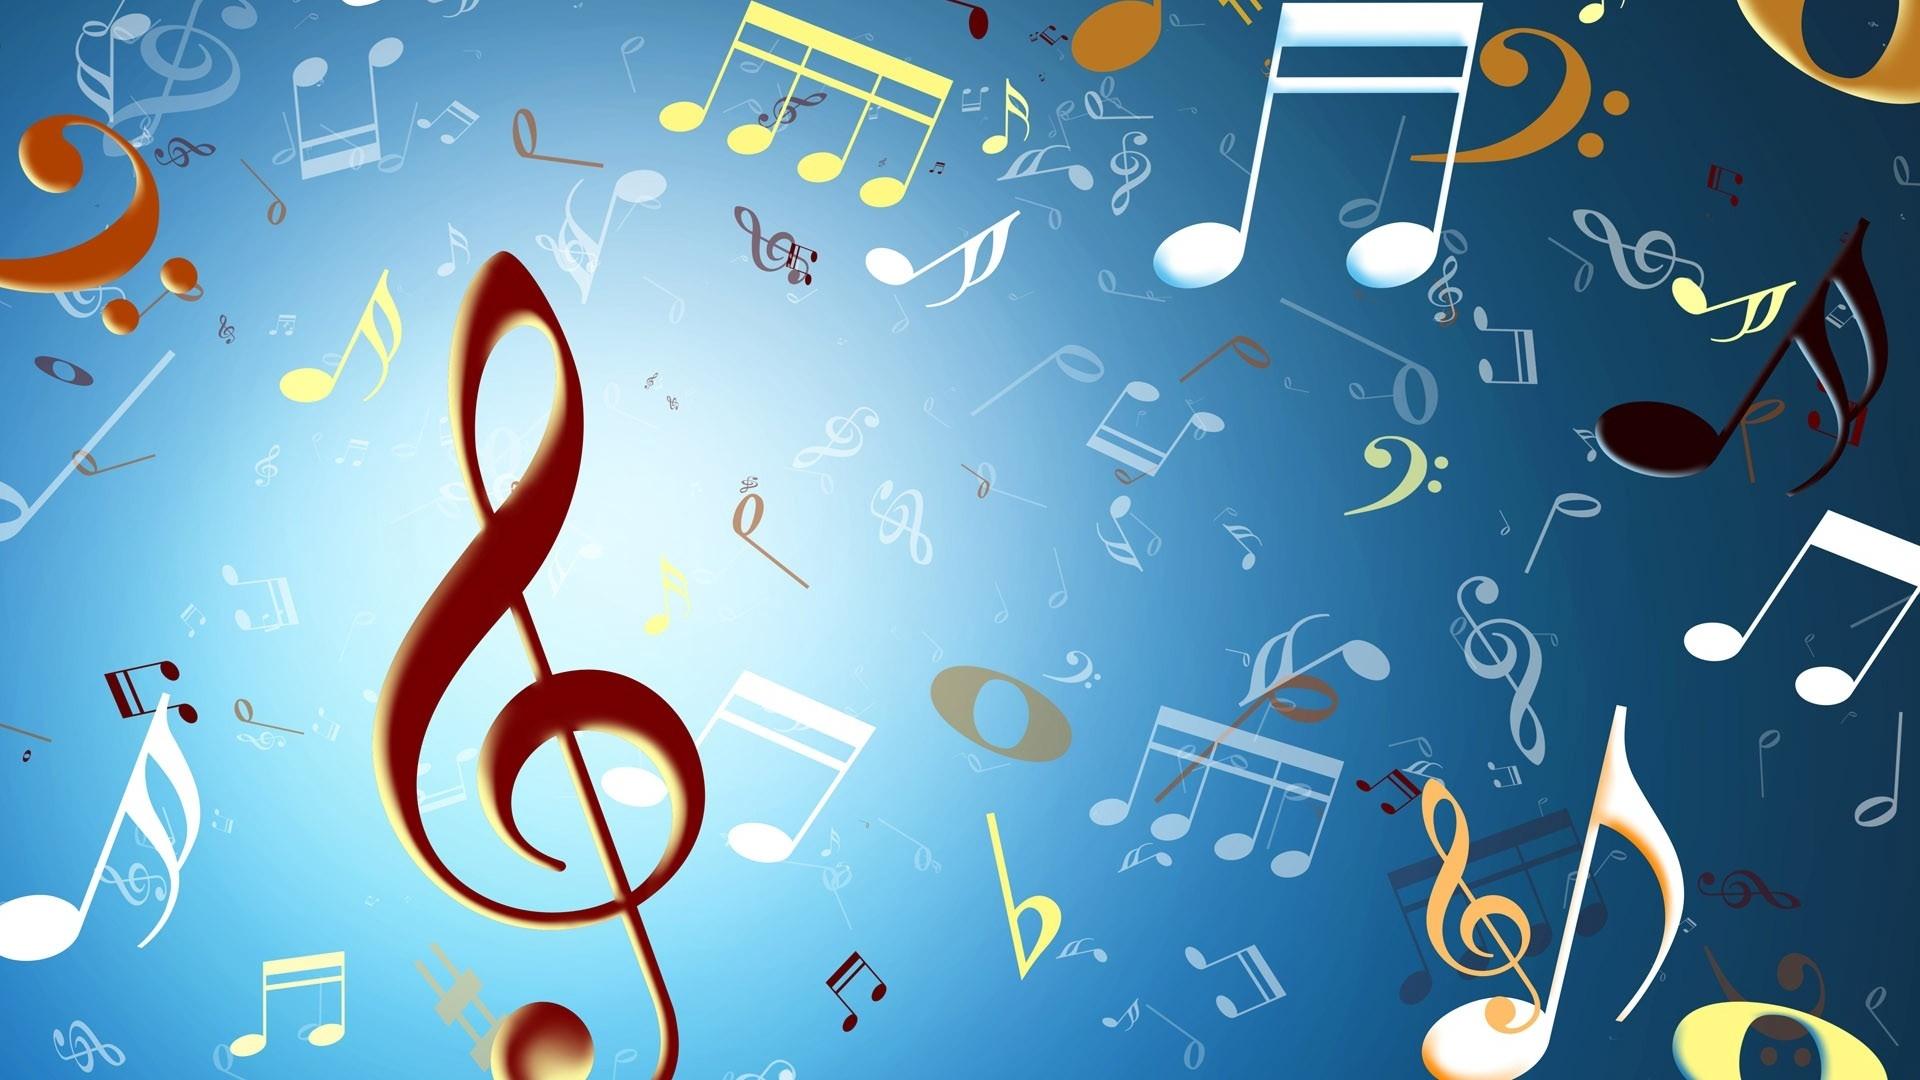 Music background texture wallpaper